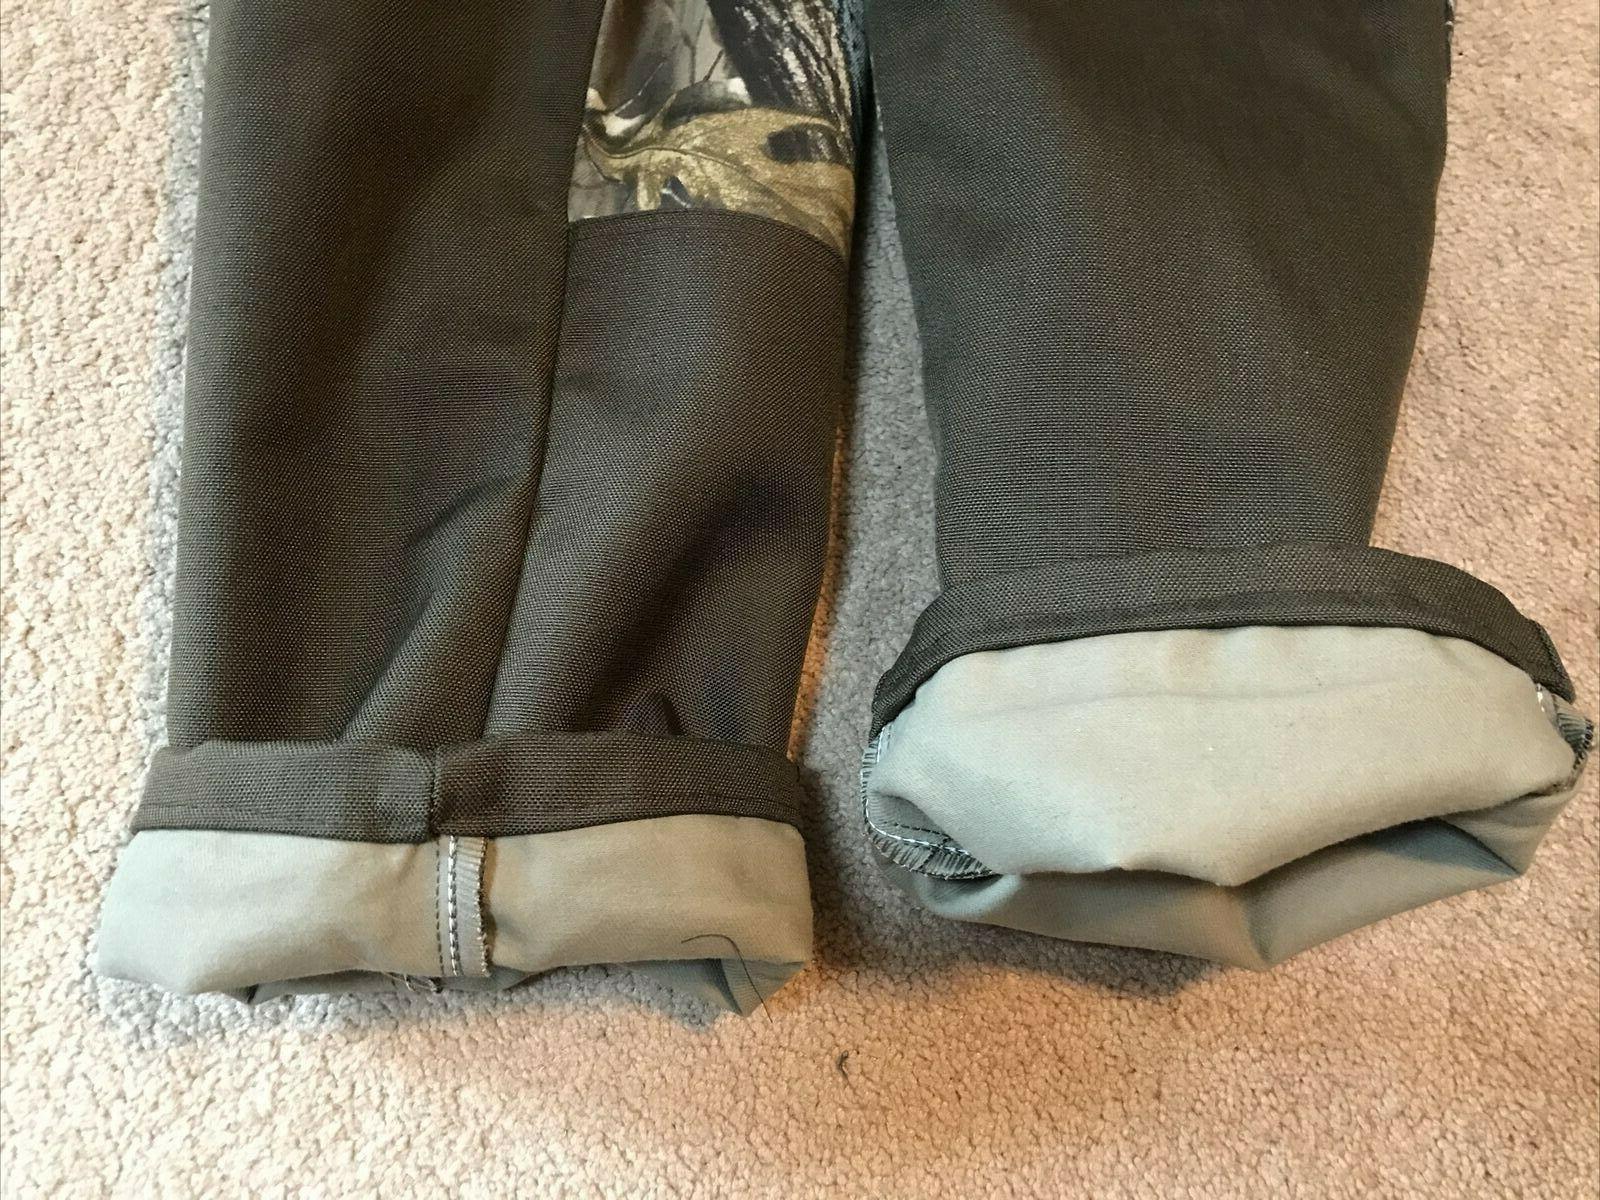 "Men's Hunting Outdoors Outerwear Camo Pants. x 30"". Wrangler Pro NWOT!"